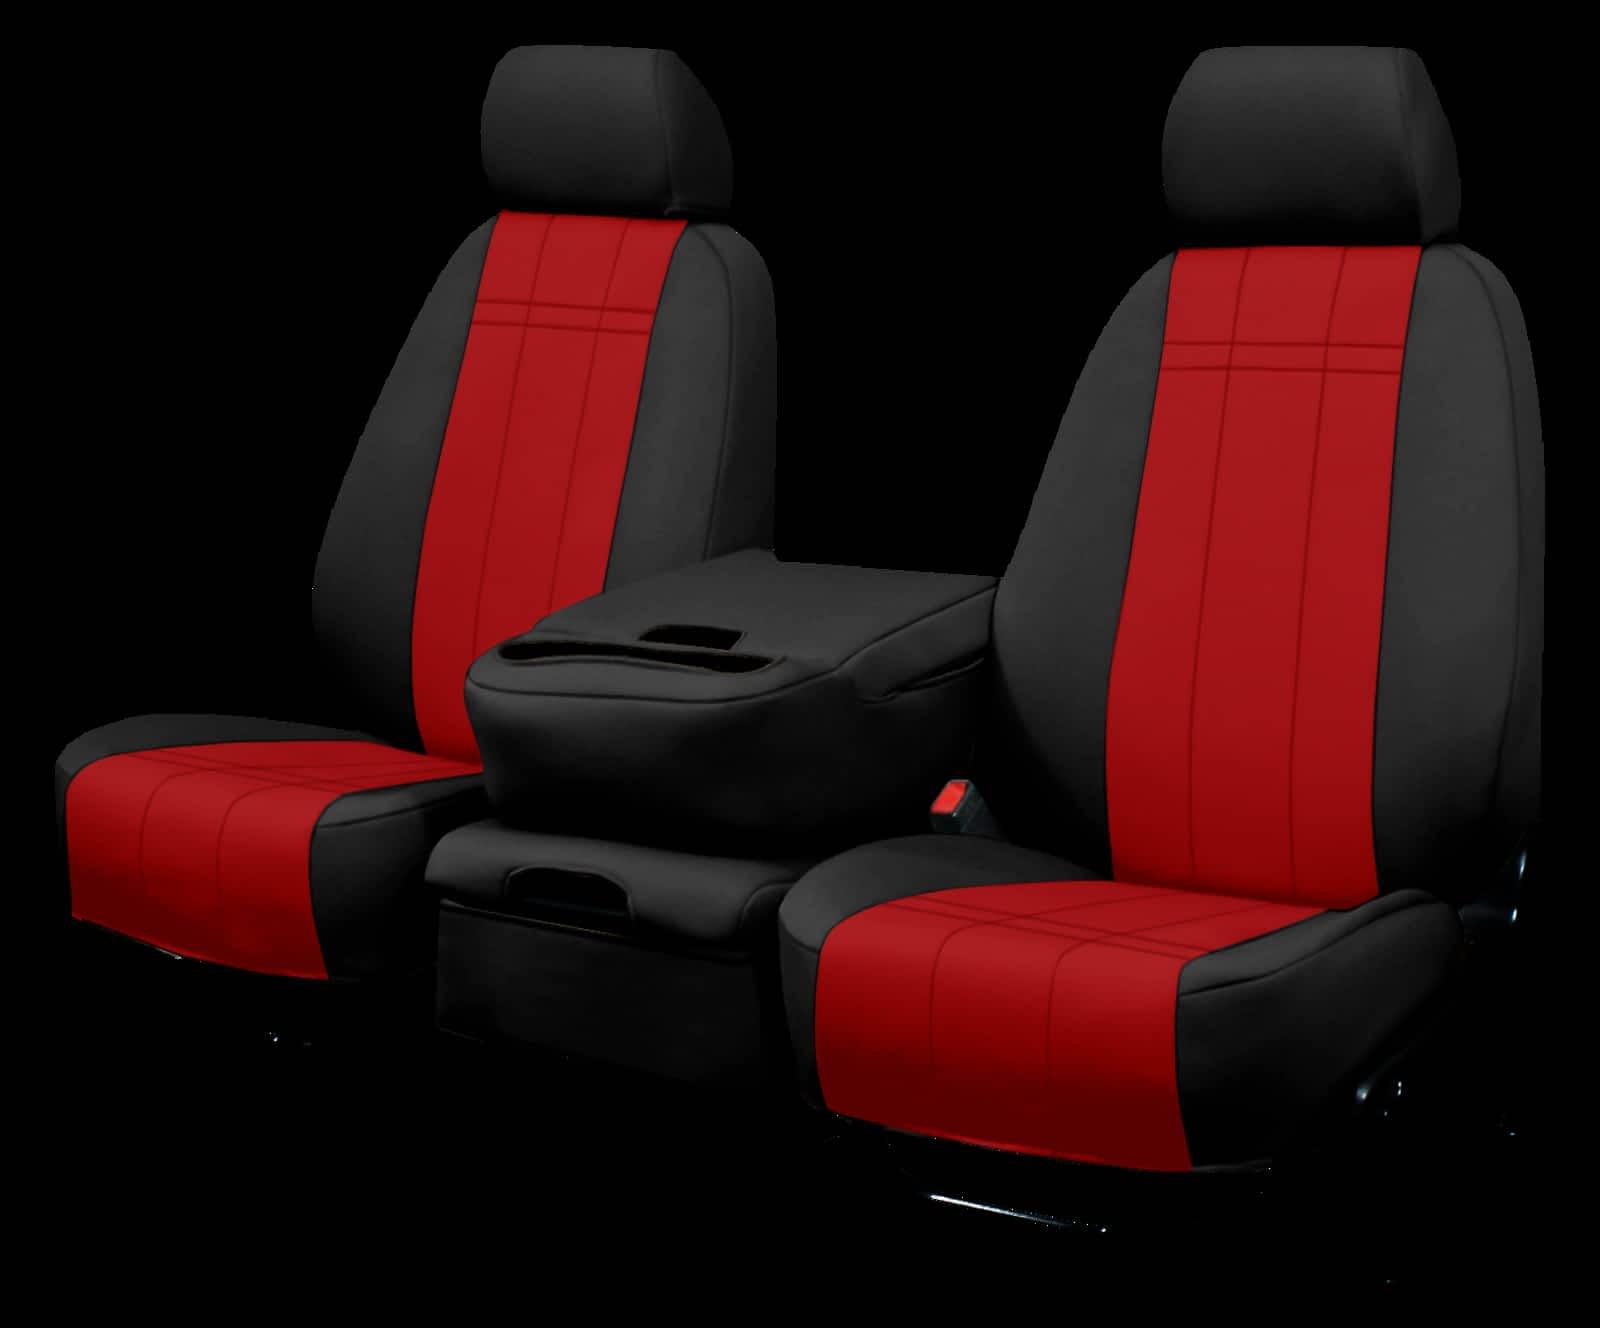 shear comfort cordura seat cover reviews velcromag. Black Bedroom Furniture Sets. Home Design Ideas